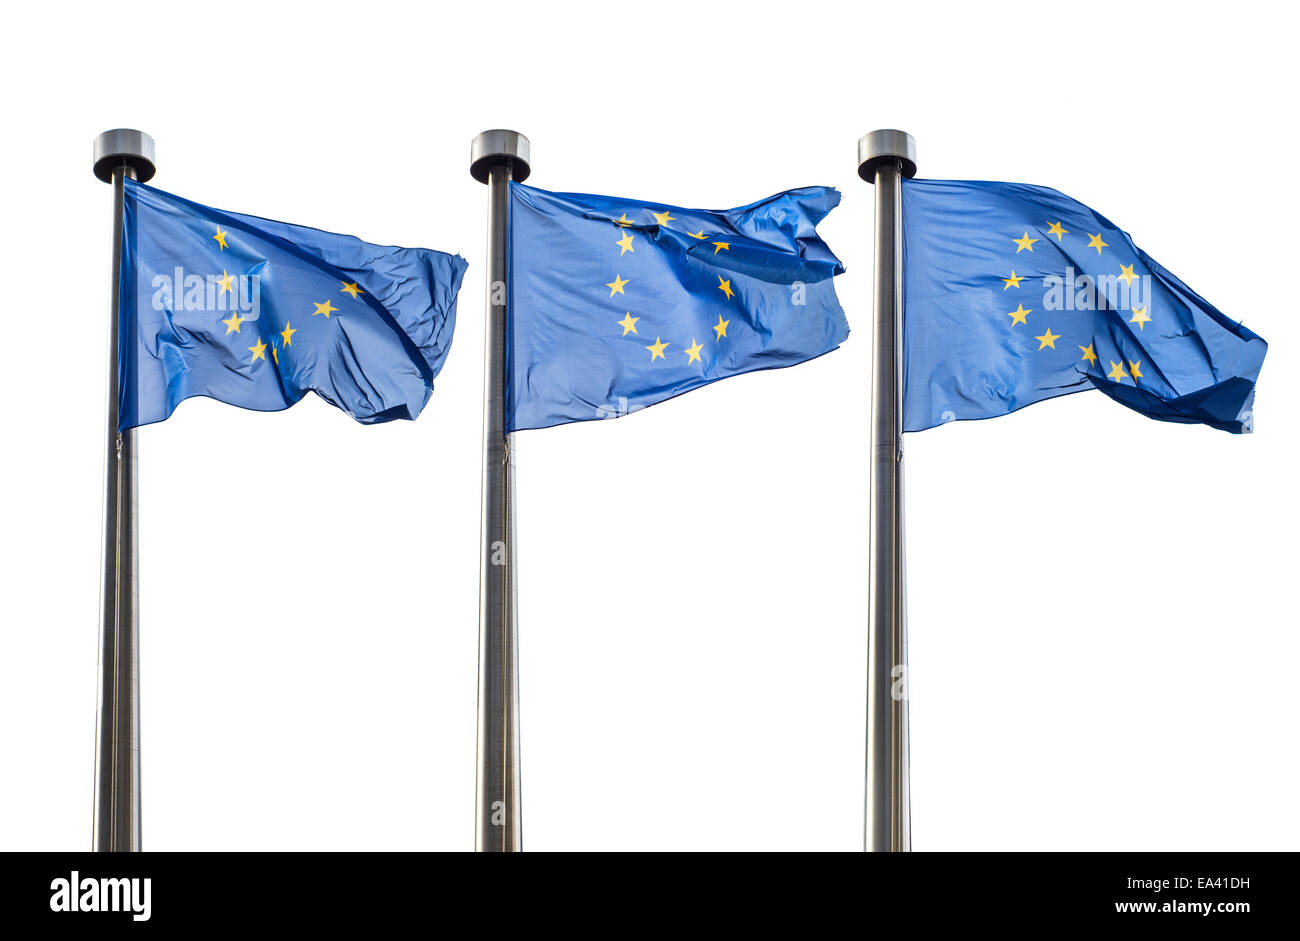 European Union flags isolated on white - Stock Image